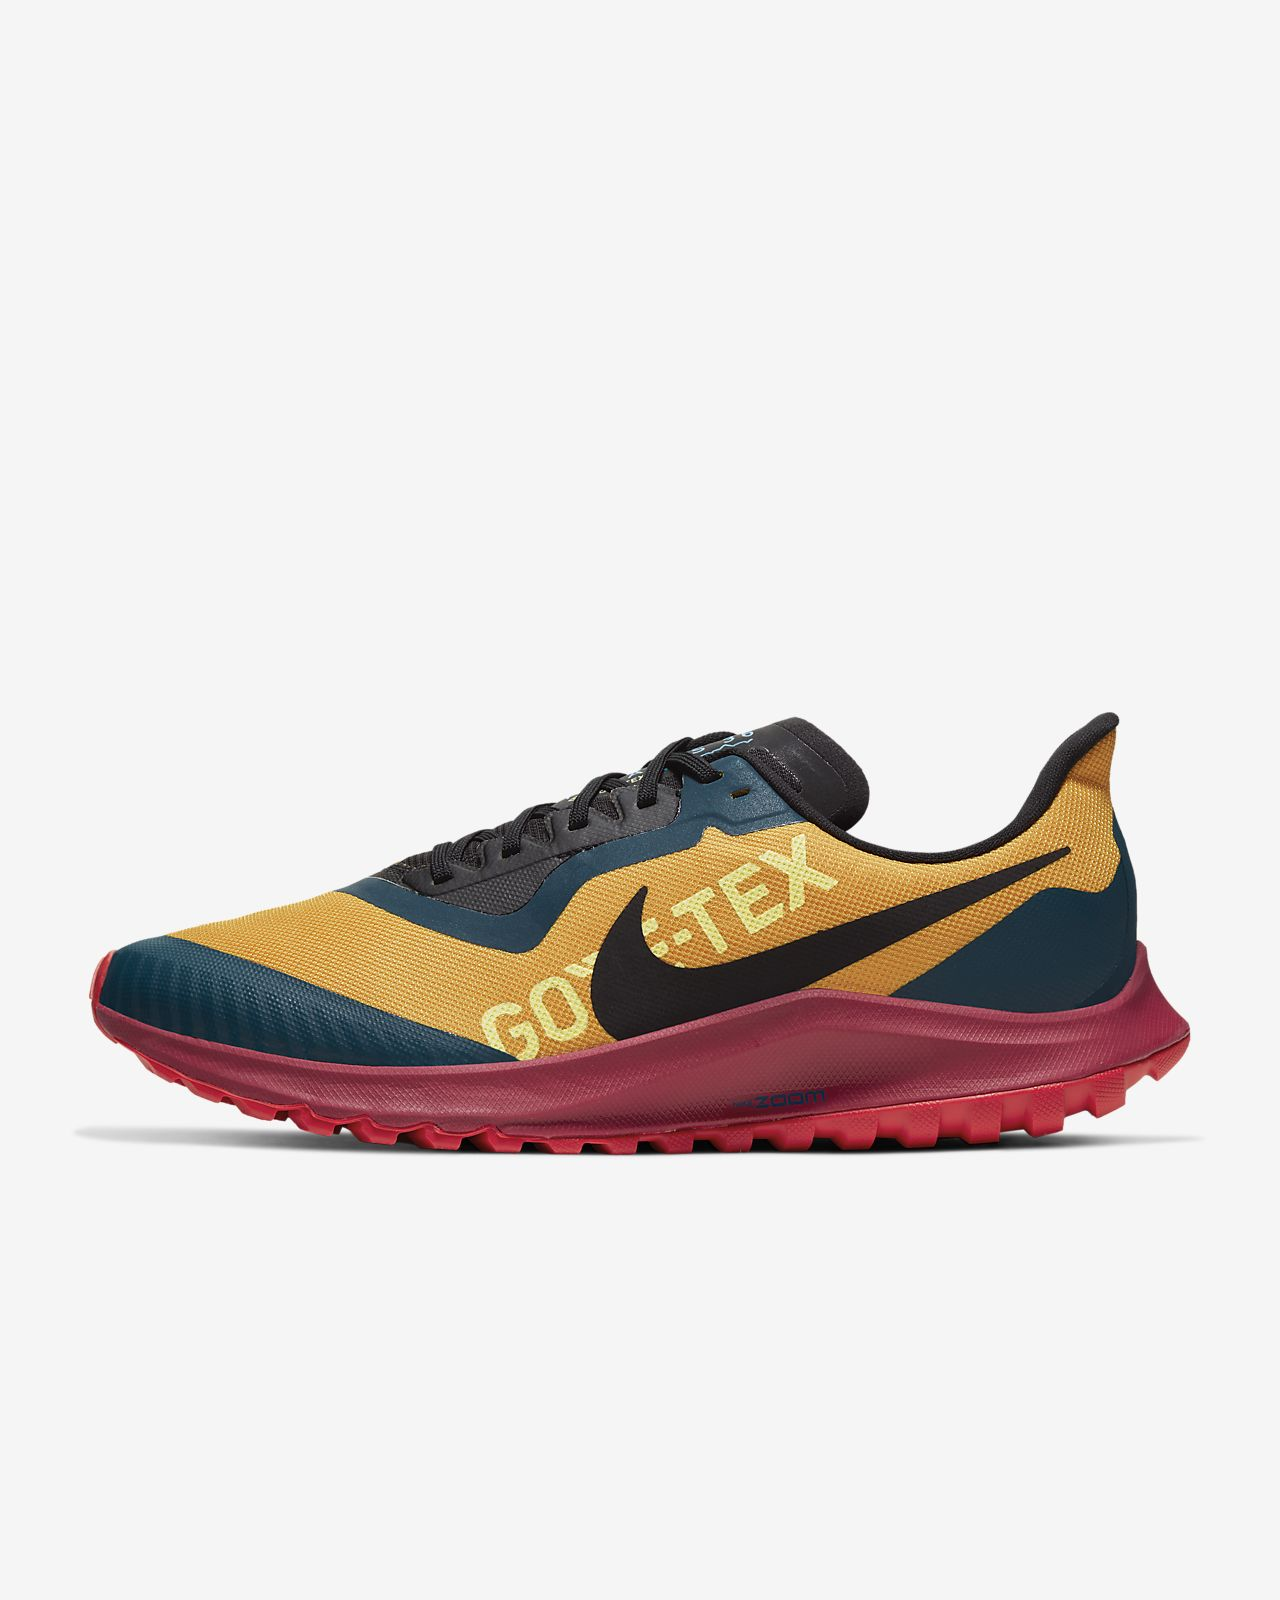 Кроссовки для трейлраннинга Nike Air Zoom Pegasus 36 Trail GORE-TEX